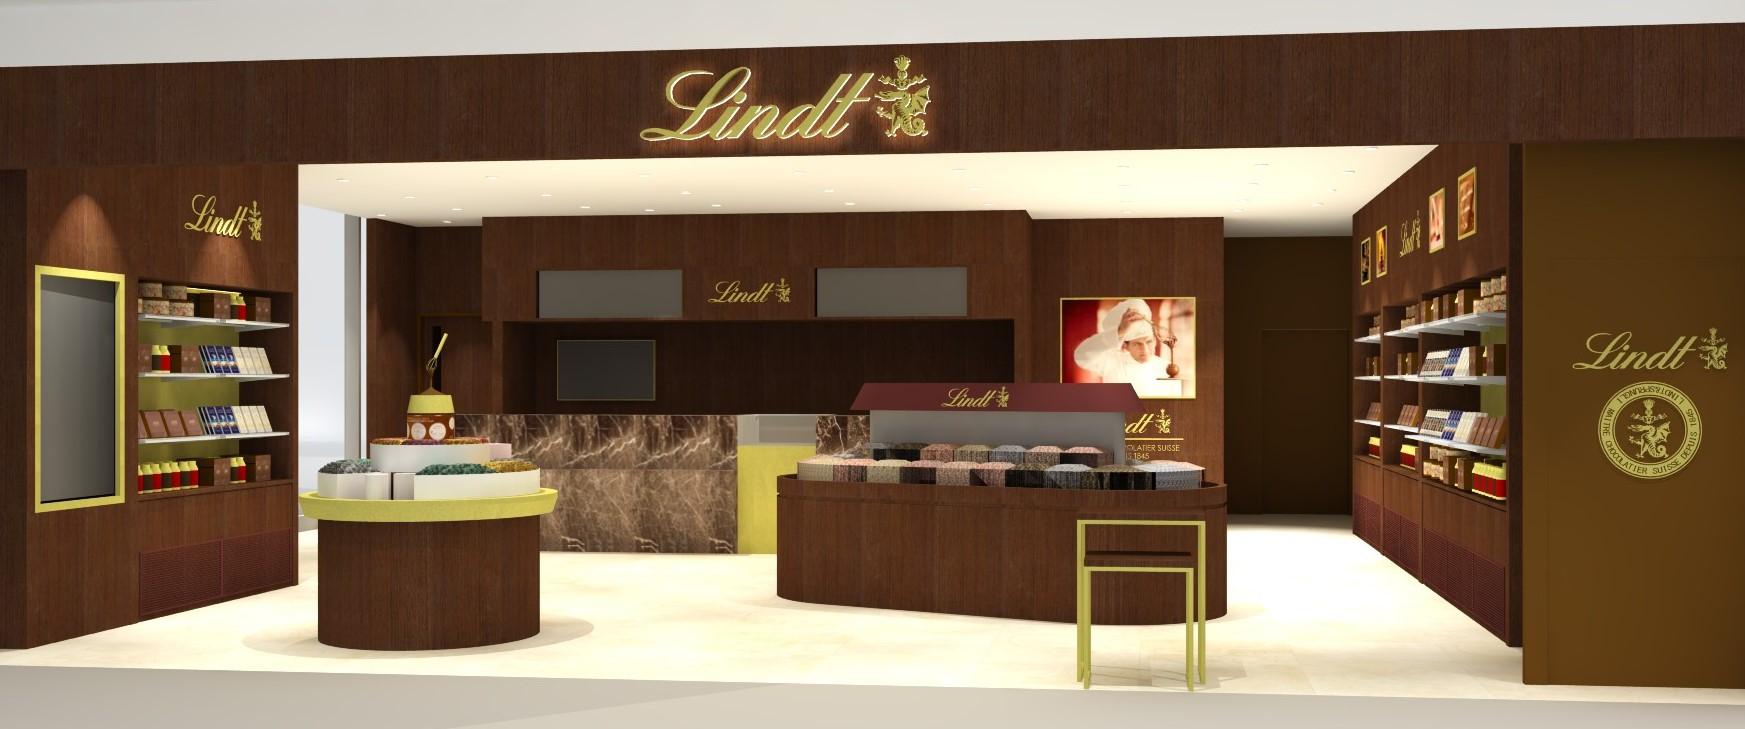 lindt-chocolate-cafe-%e3%83%aa%e3%83%b3%e3%83%84%e3%83%81%e3%83%a7%e3%82%b3%e3%82%ab%e3%83%95%e3%82%a7-lindt-%e5%b7%a7%e5%85%8b%e5%8a%9b-%e5%92%96%e5%95%a1%e5%ba%97